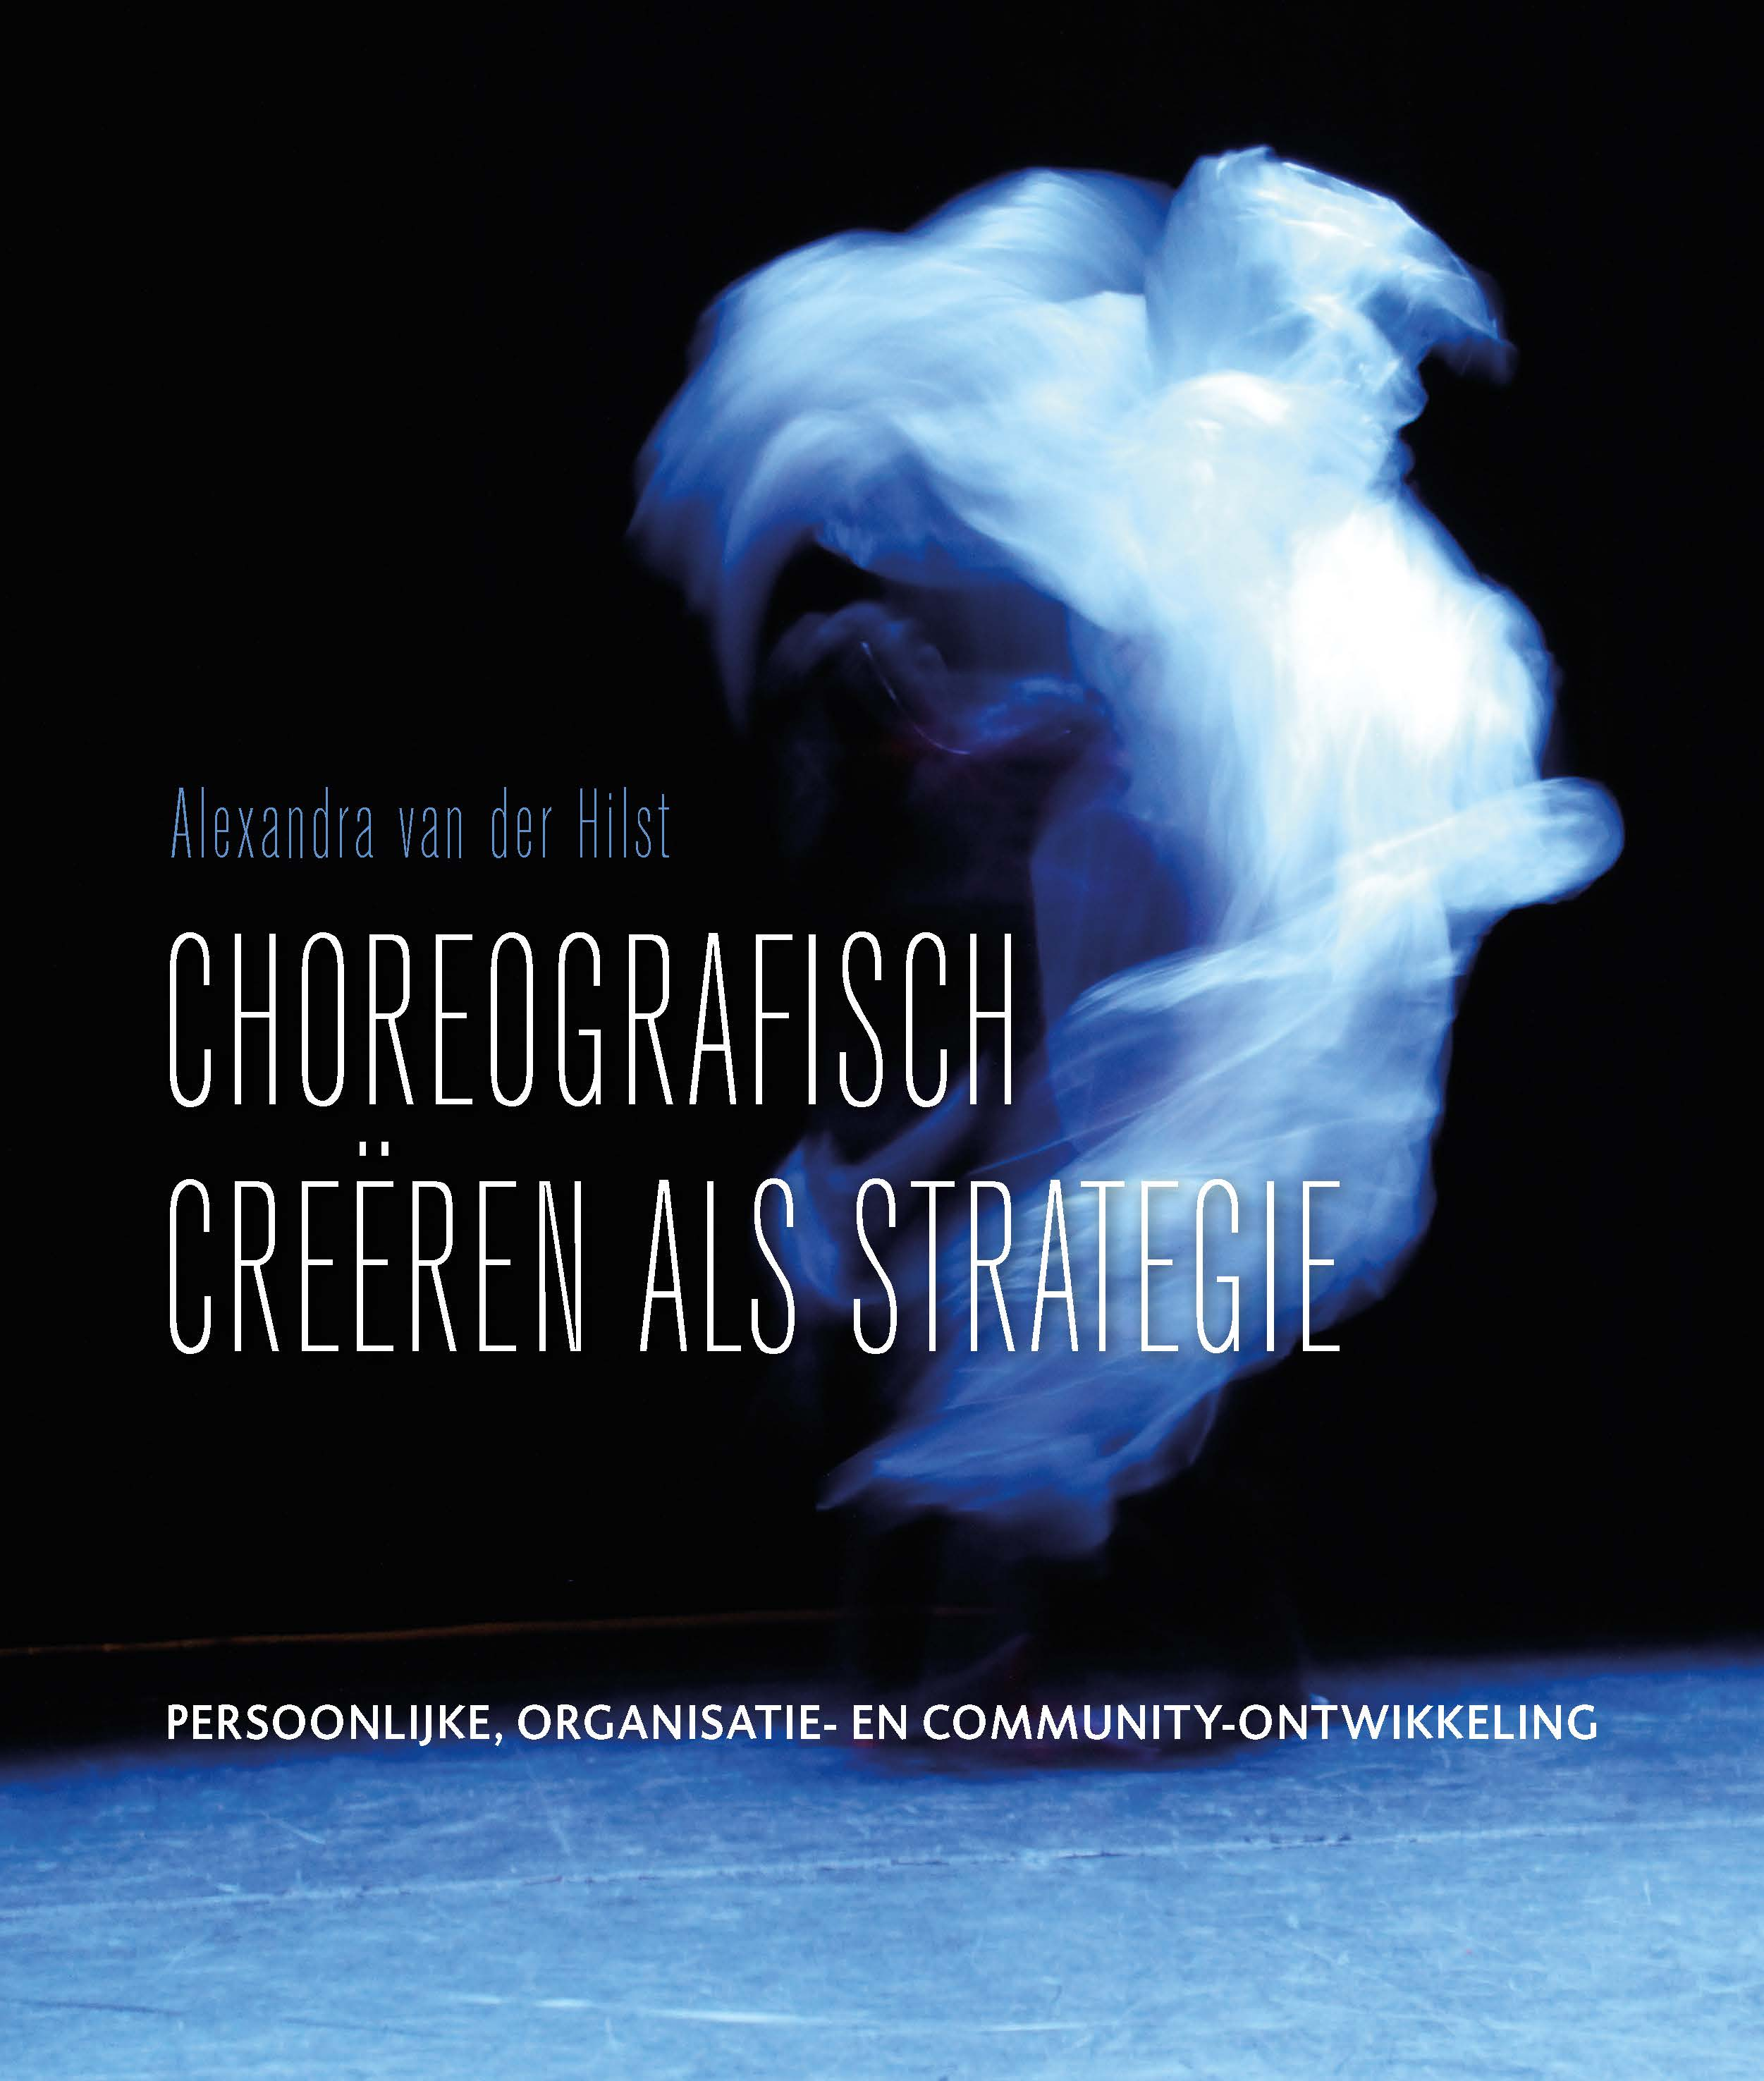 AB3 - Choreografisch creeren